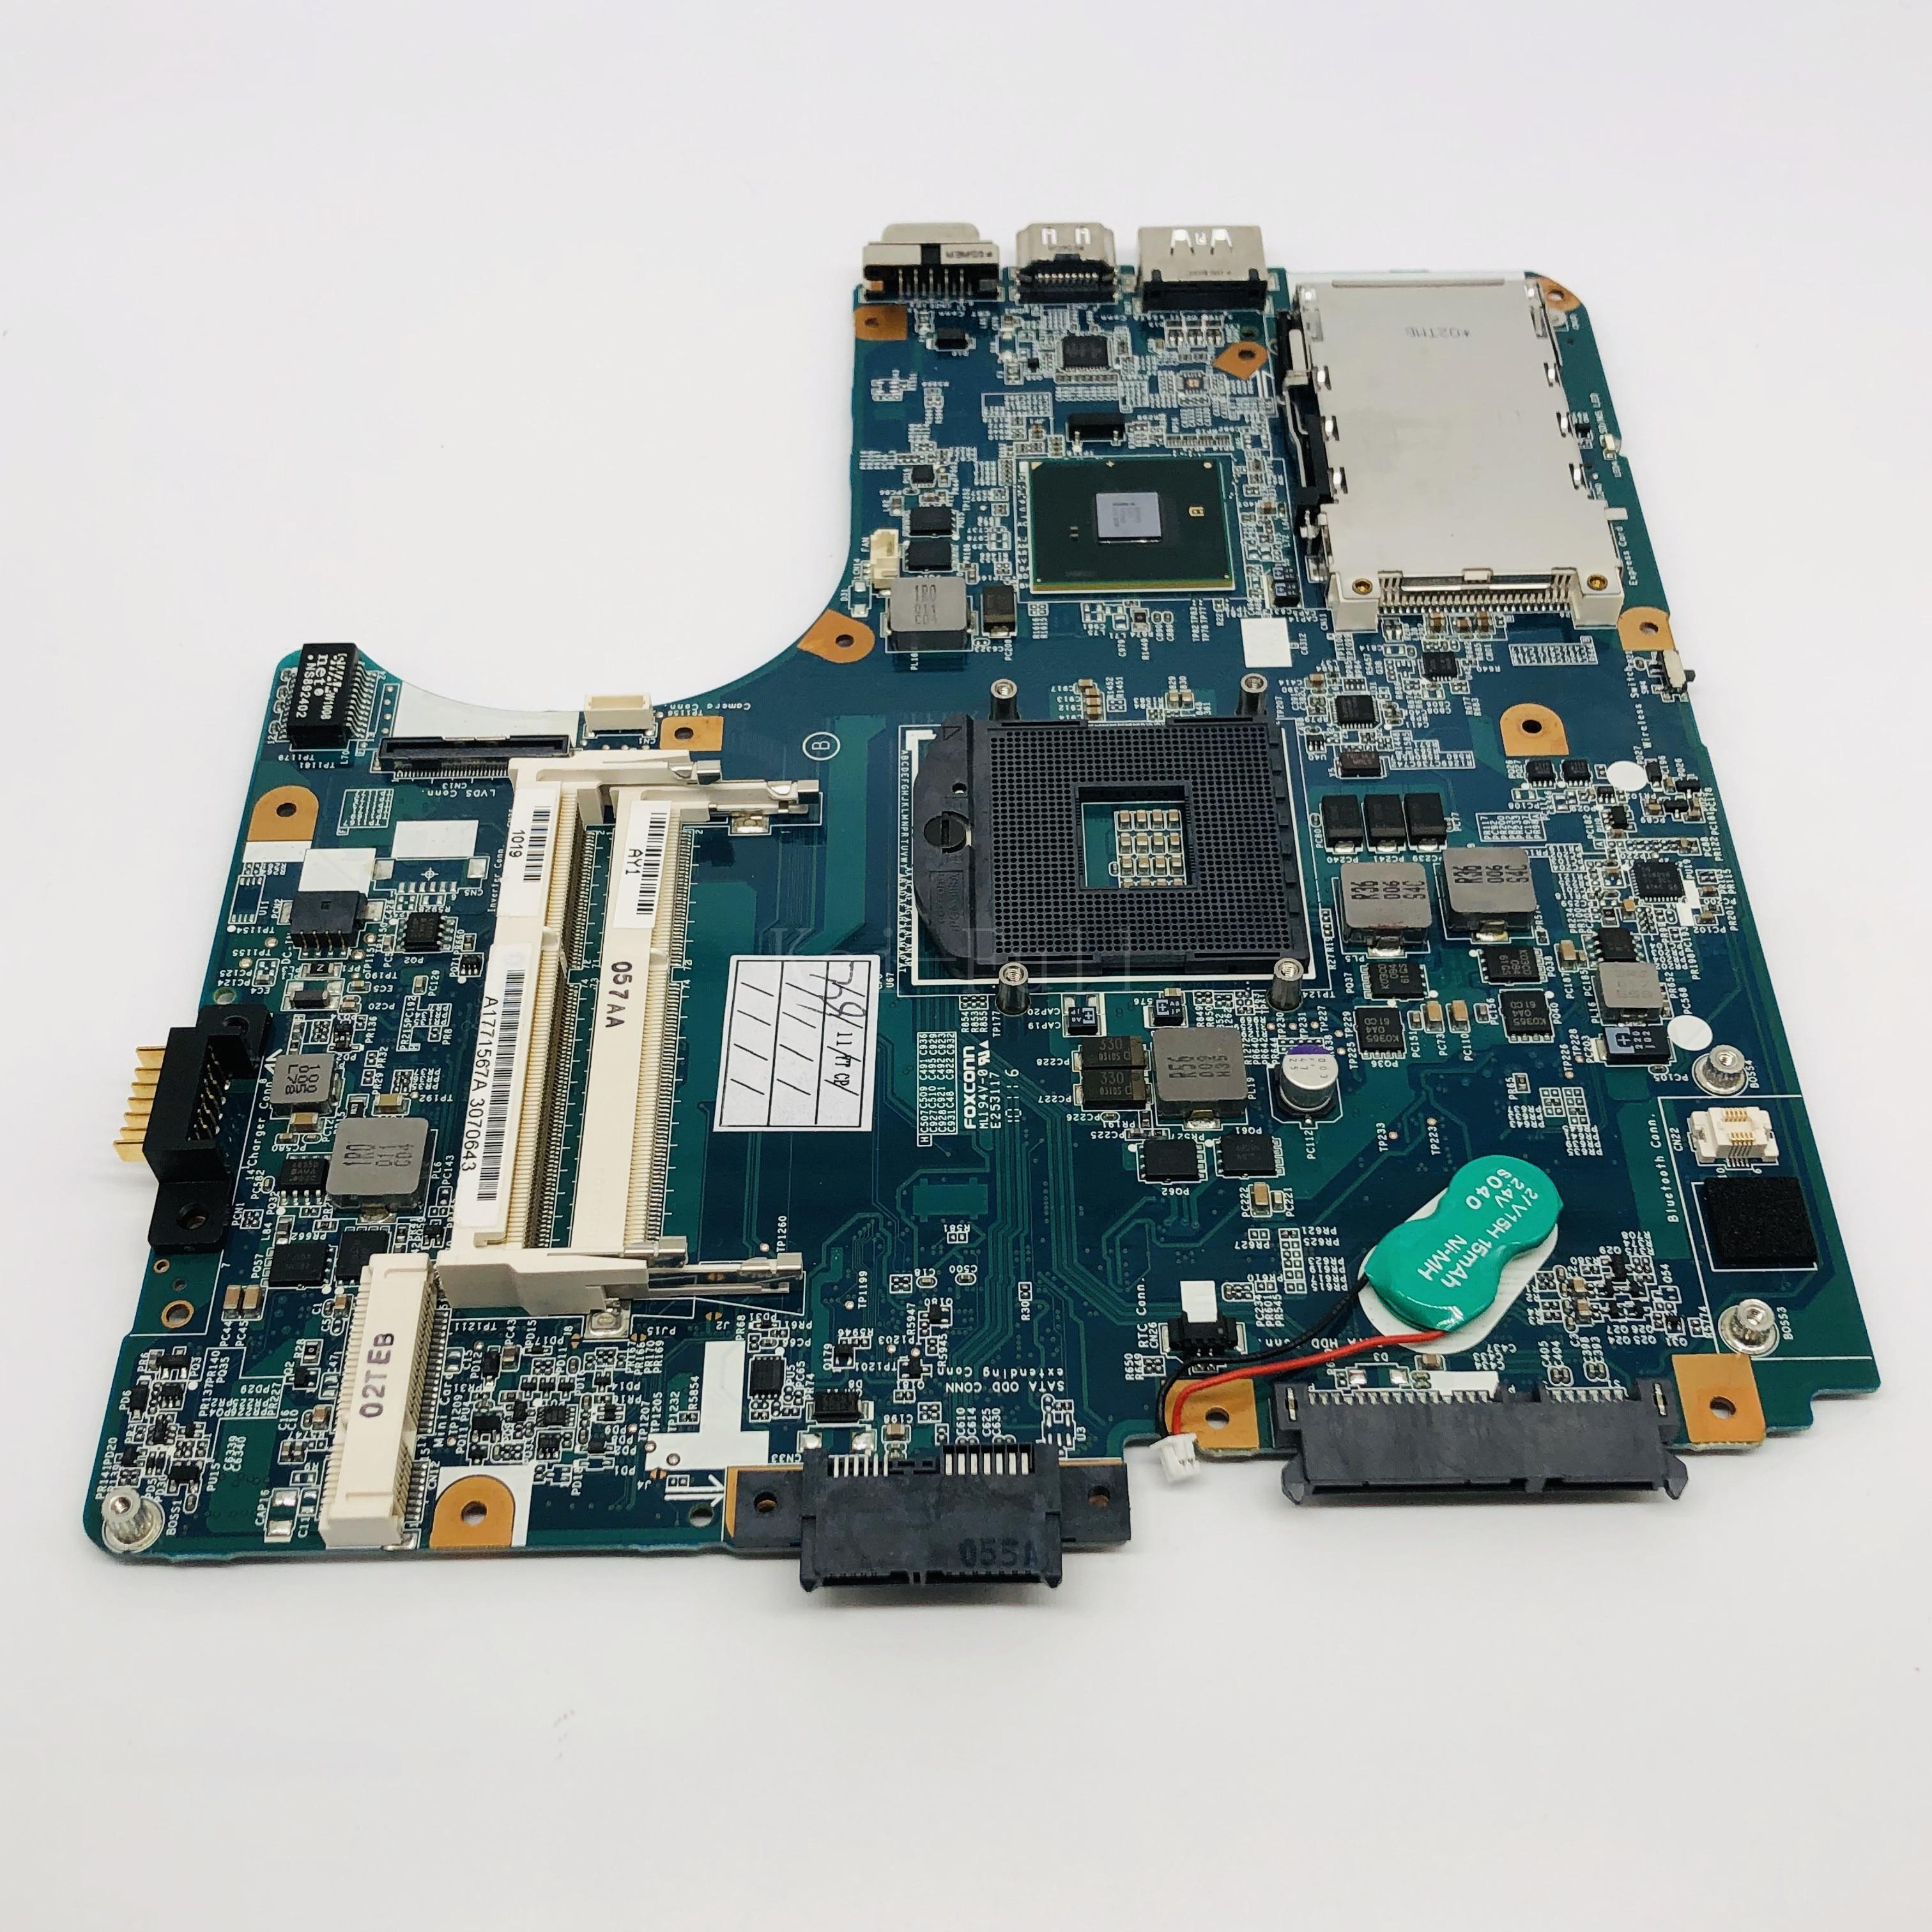 Placa base para portátil Sony VPCEA PC placa base A1771567A MBX-223 M960 tesed DDR3